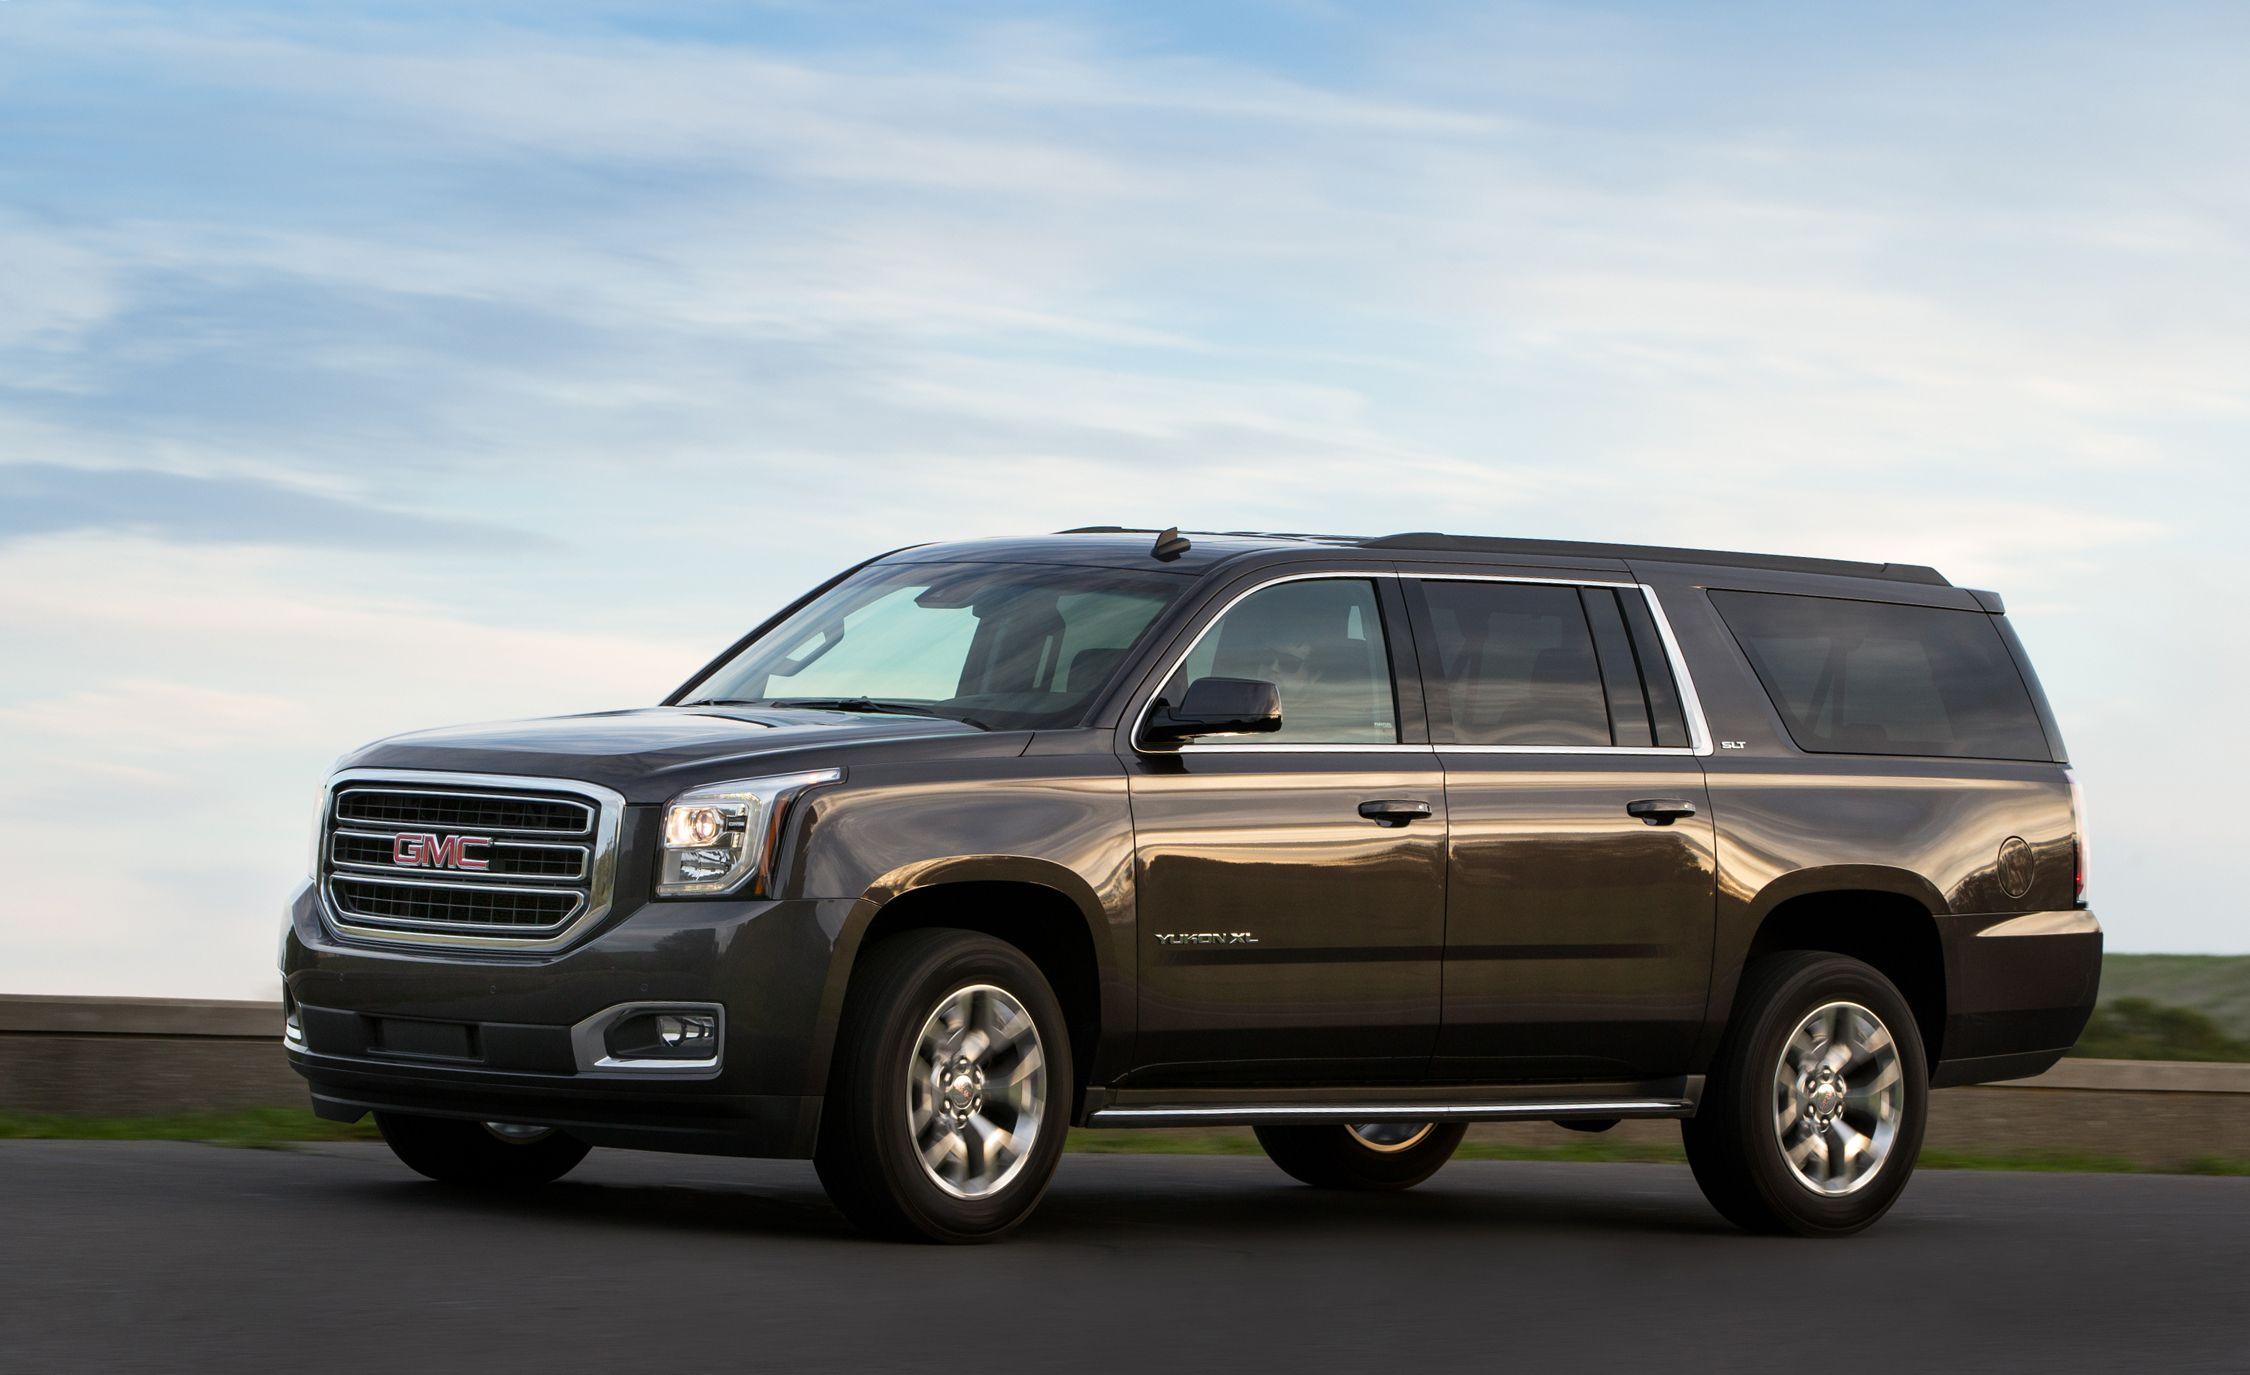 2019 GMC Yukon Review, Price >> 2018 GMC Yukon / Yukon XL | Fuel Economy Review | Car and Driver